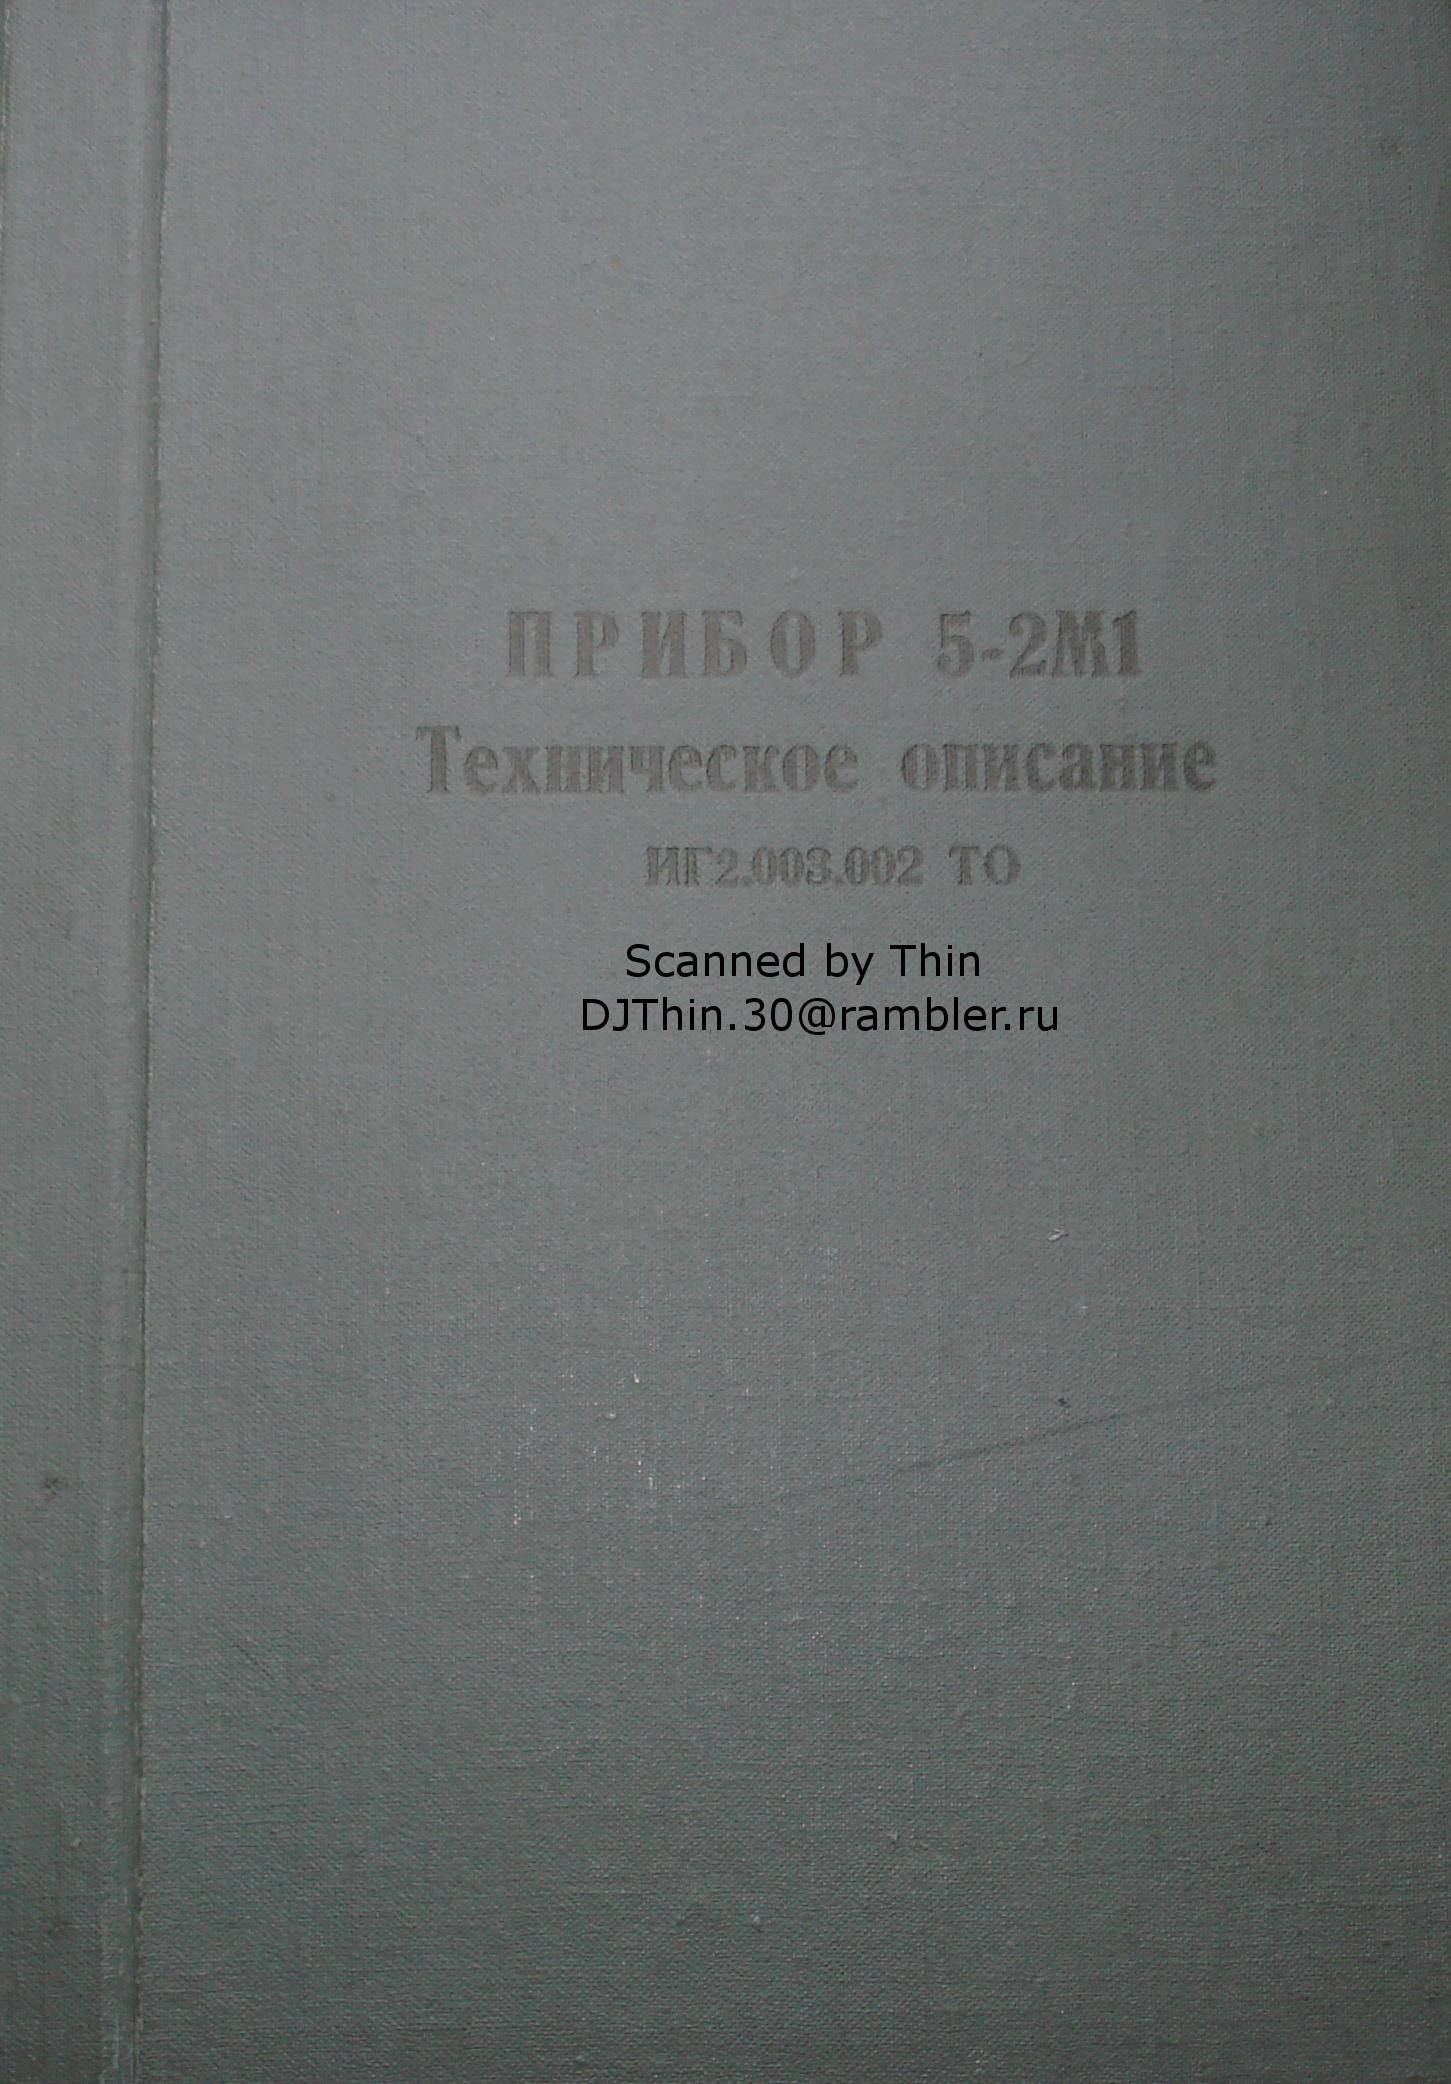 Нажмите на изображение для увеличения.  Название:DSC09582A.JPG Просмотров:2 Размер:2.38 Мб ID:194456